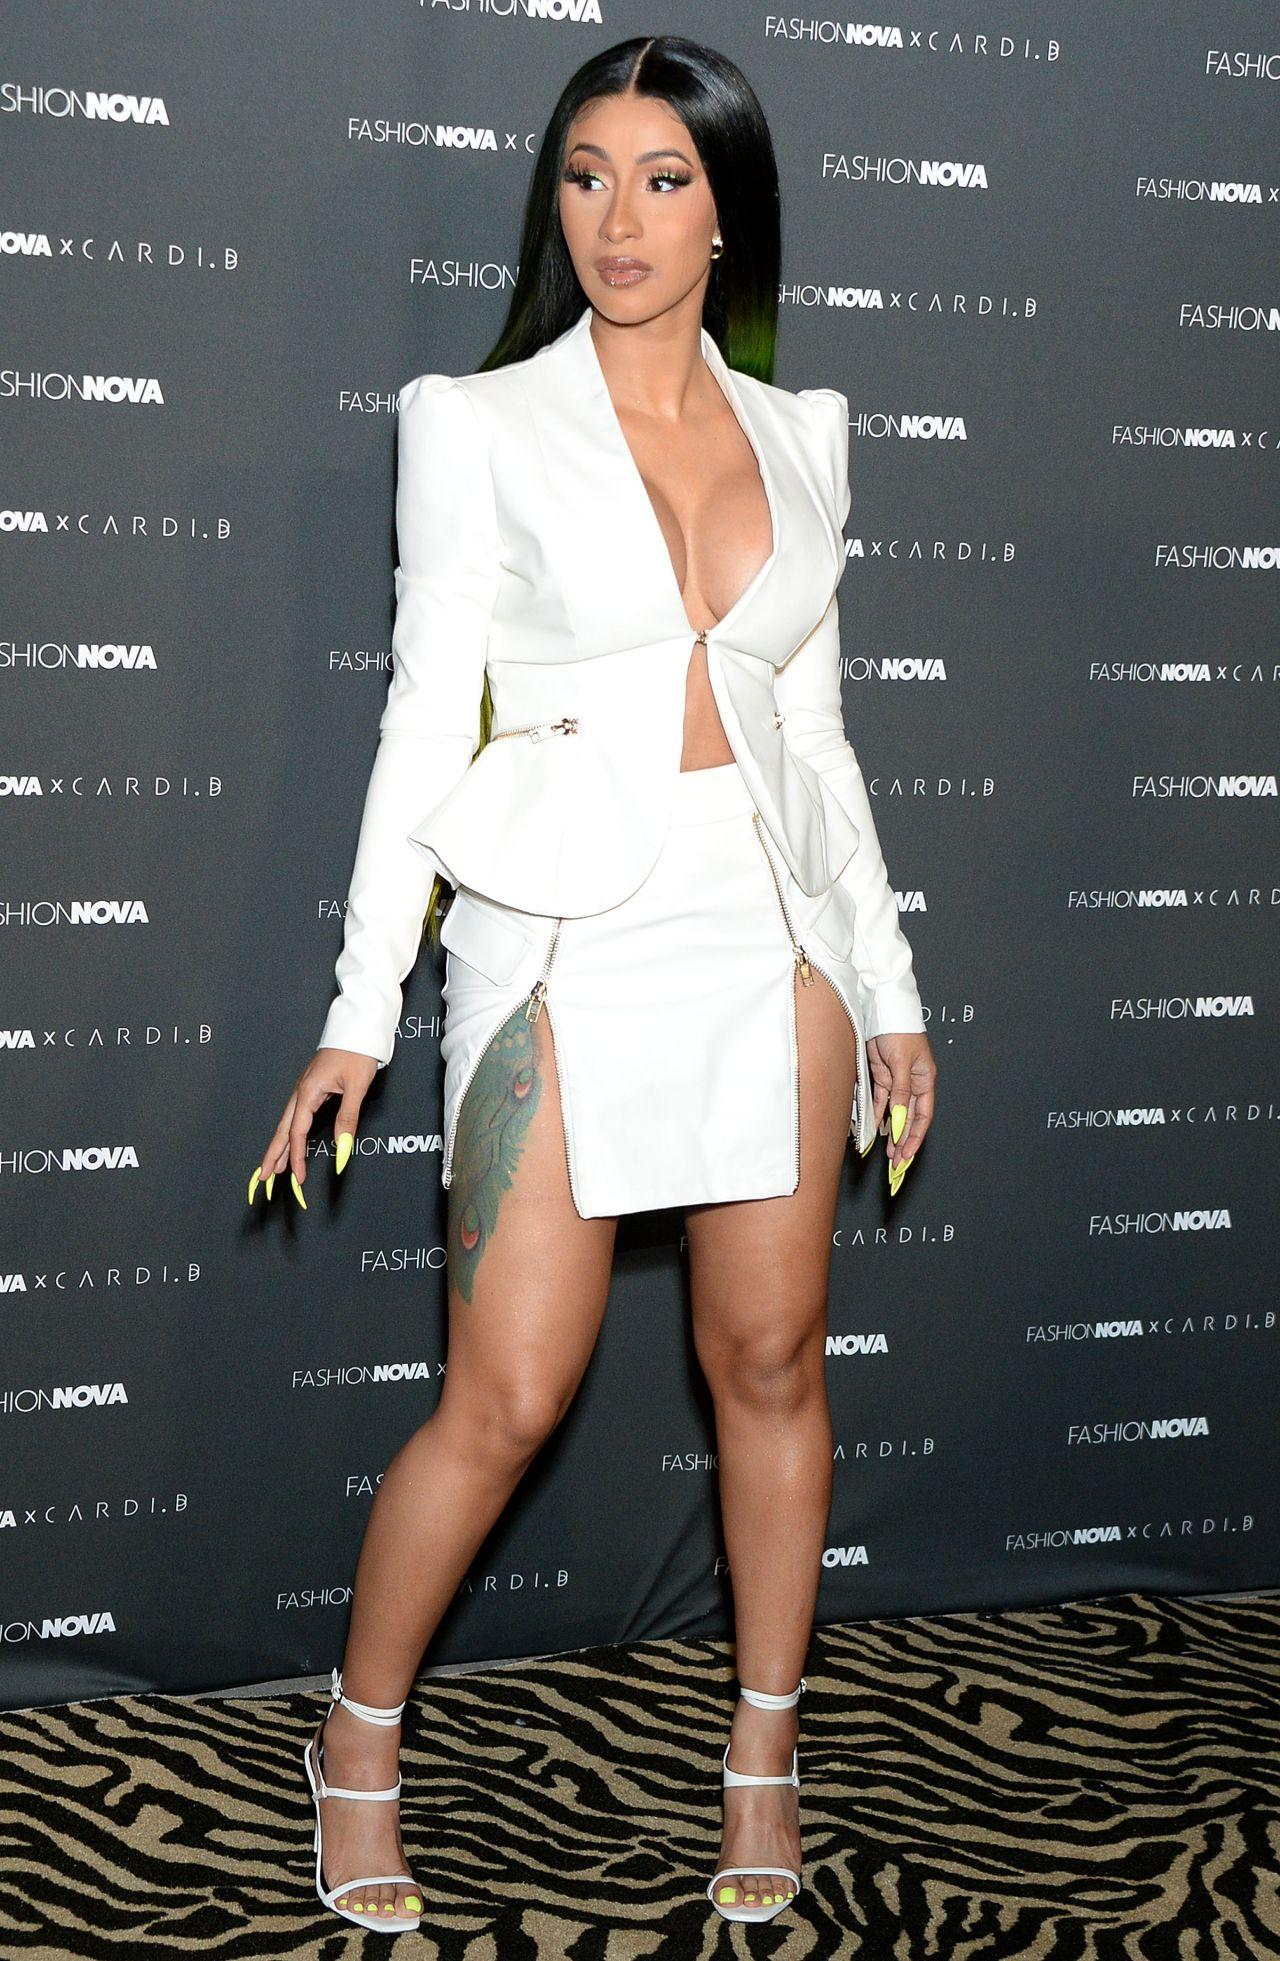 Cardi B No Clothing: Fashion Nova X Cardi B Collection Launch Event